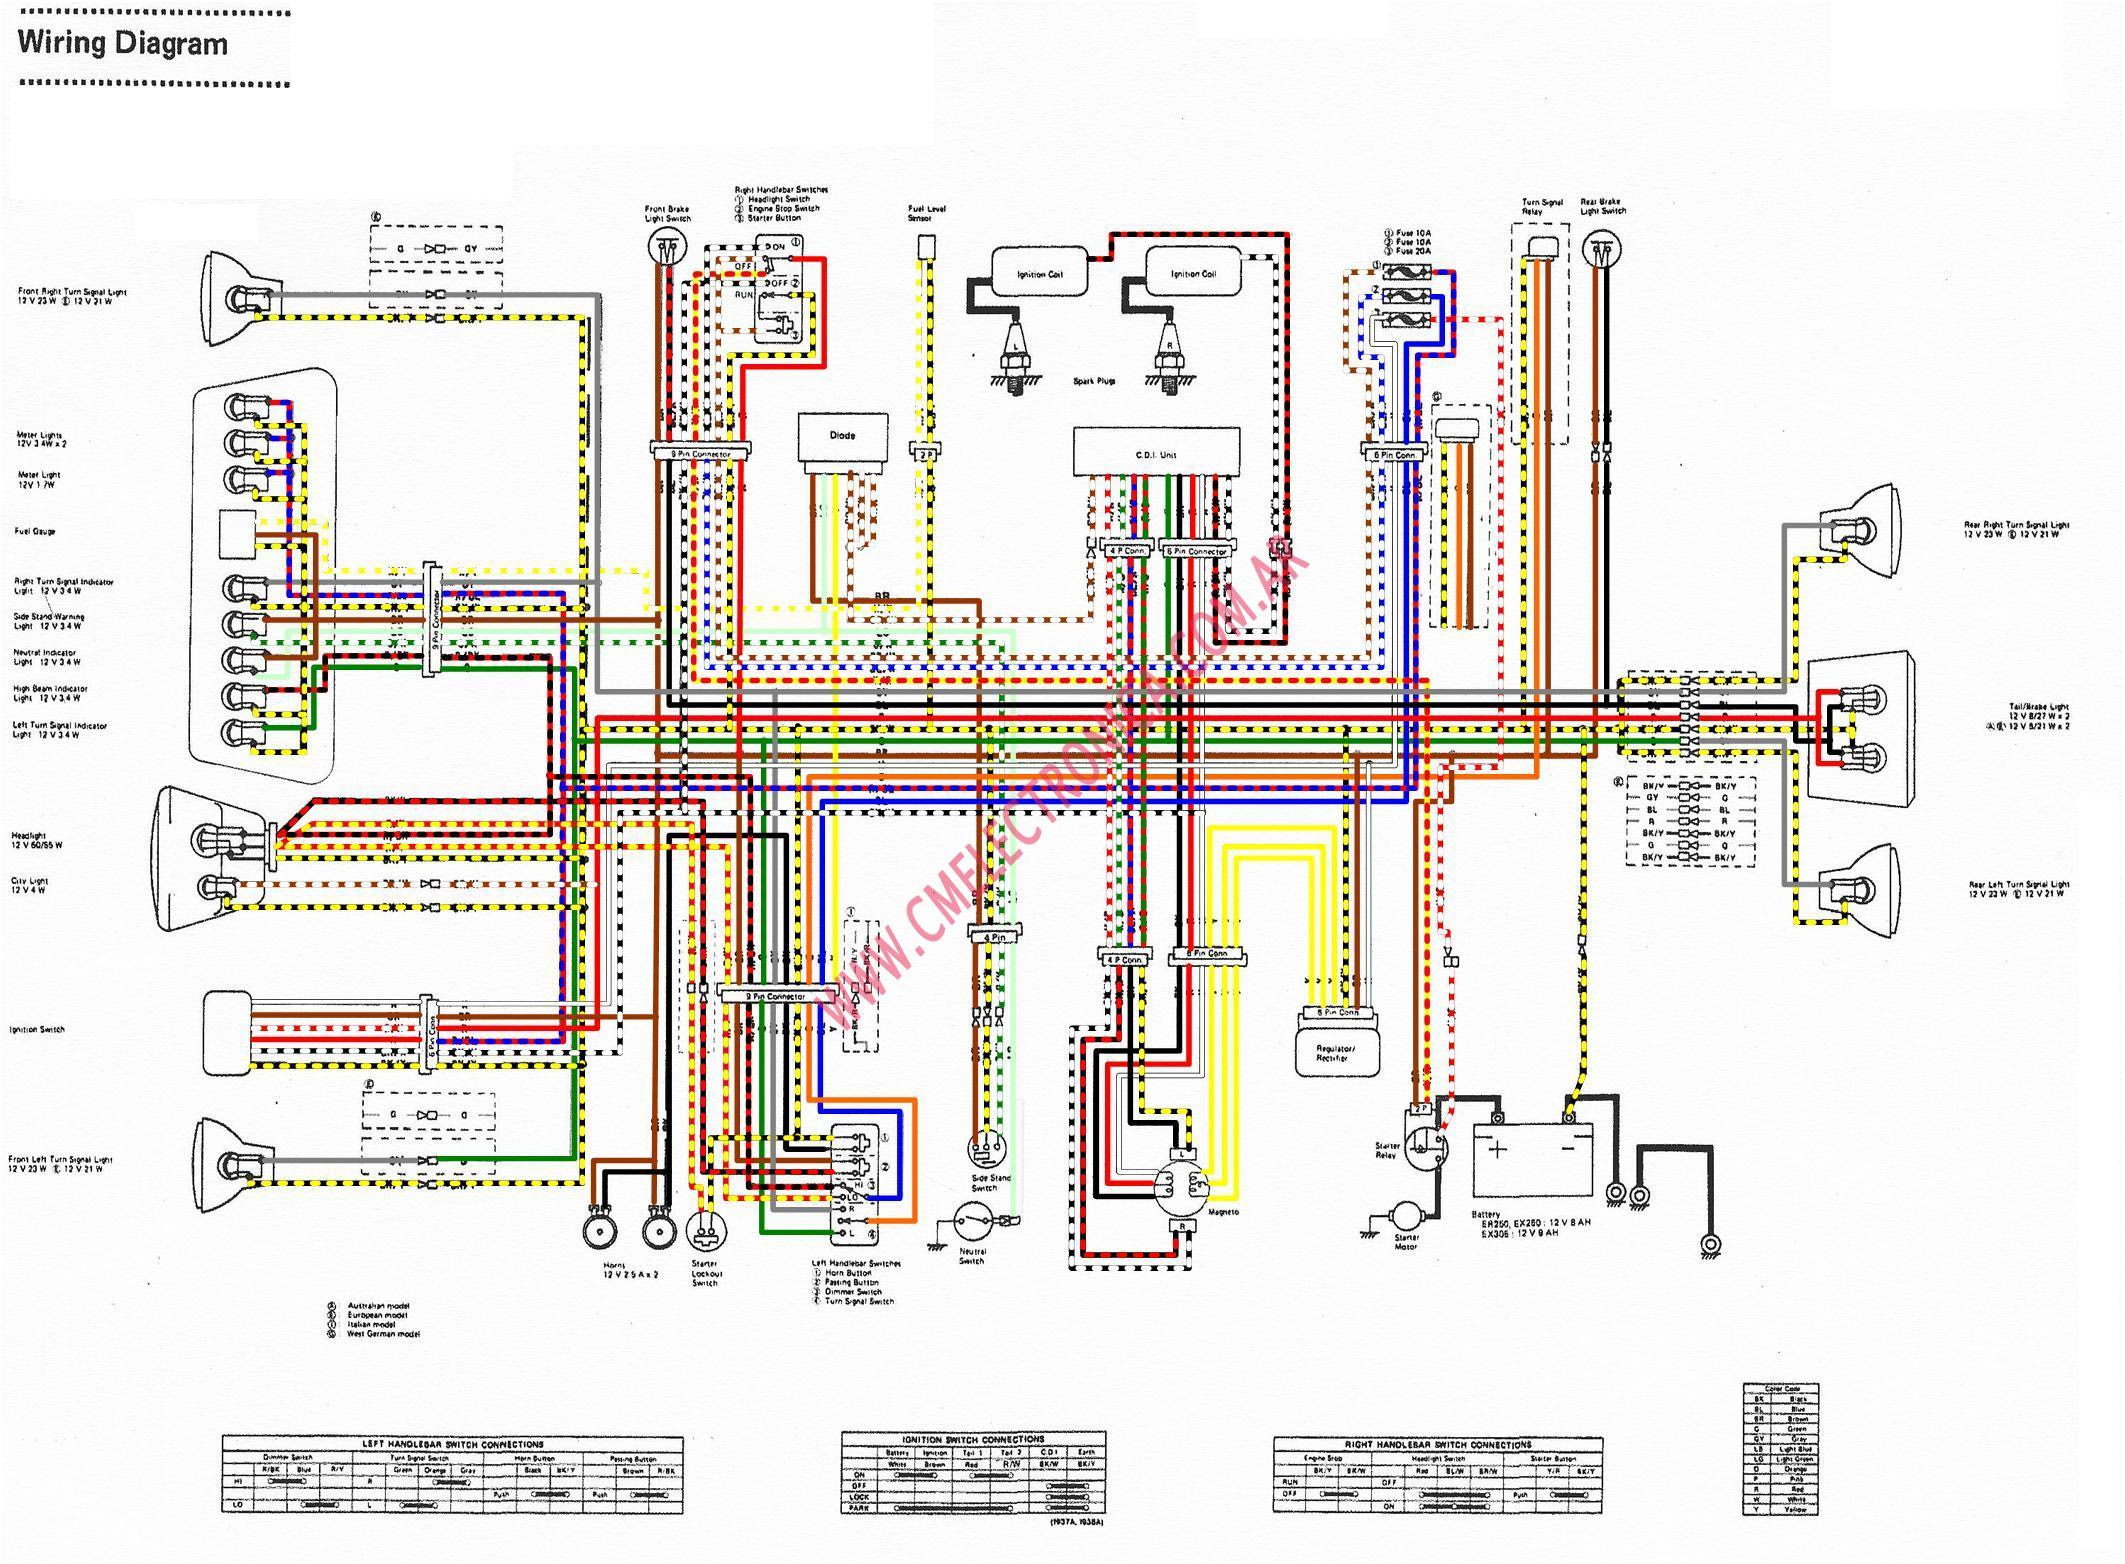 Kawasaki 5 Pin Cdi Wiring Diagram from lh6.googleusercontent.com